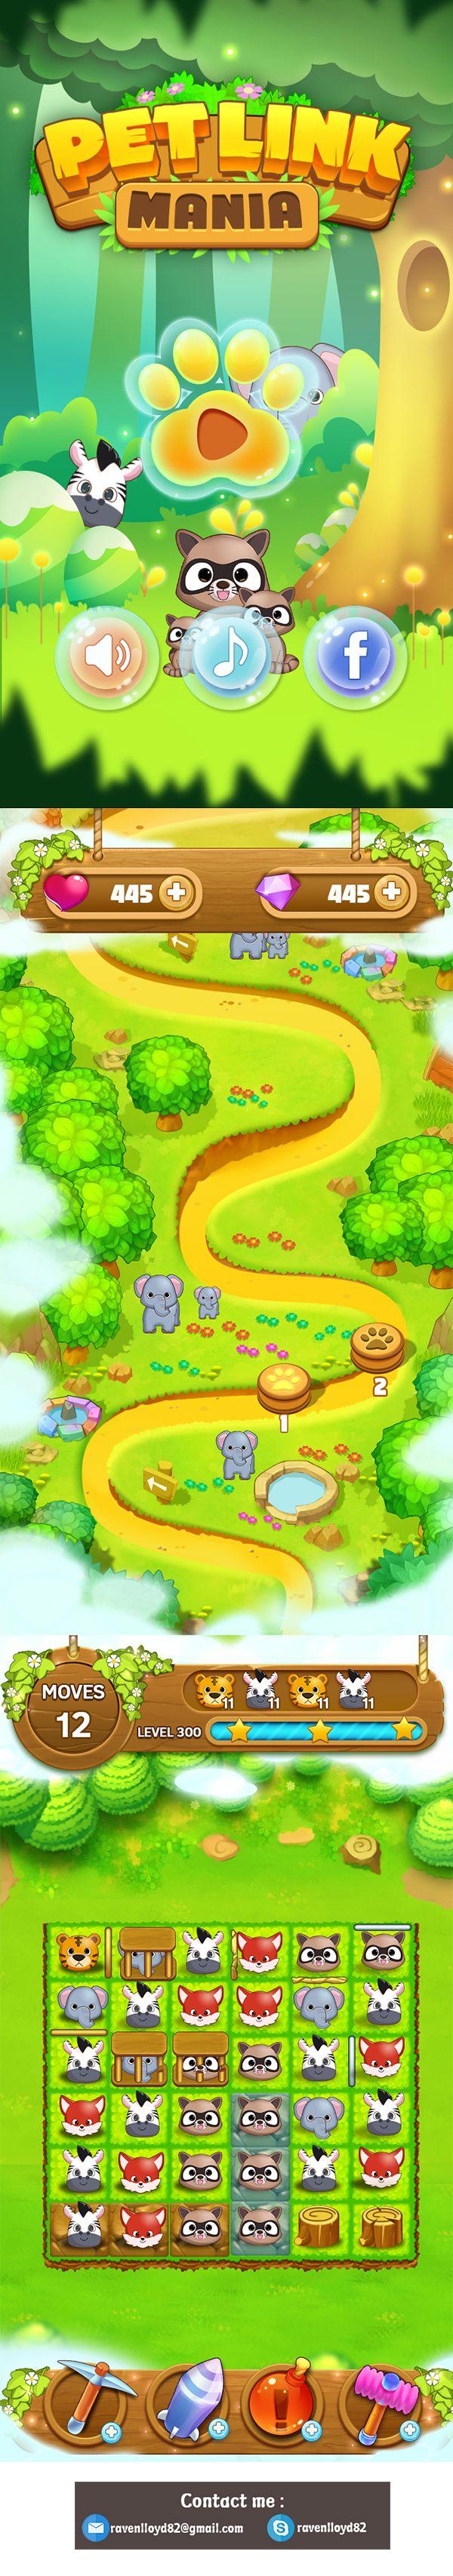 Mobile game - Wild Animal game on Behance